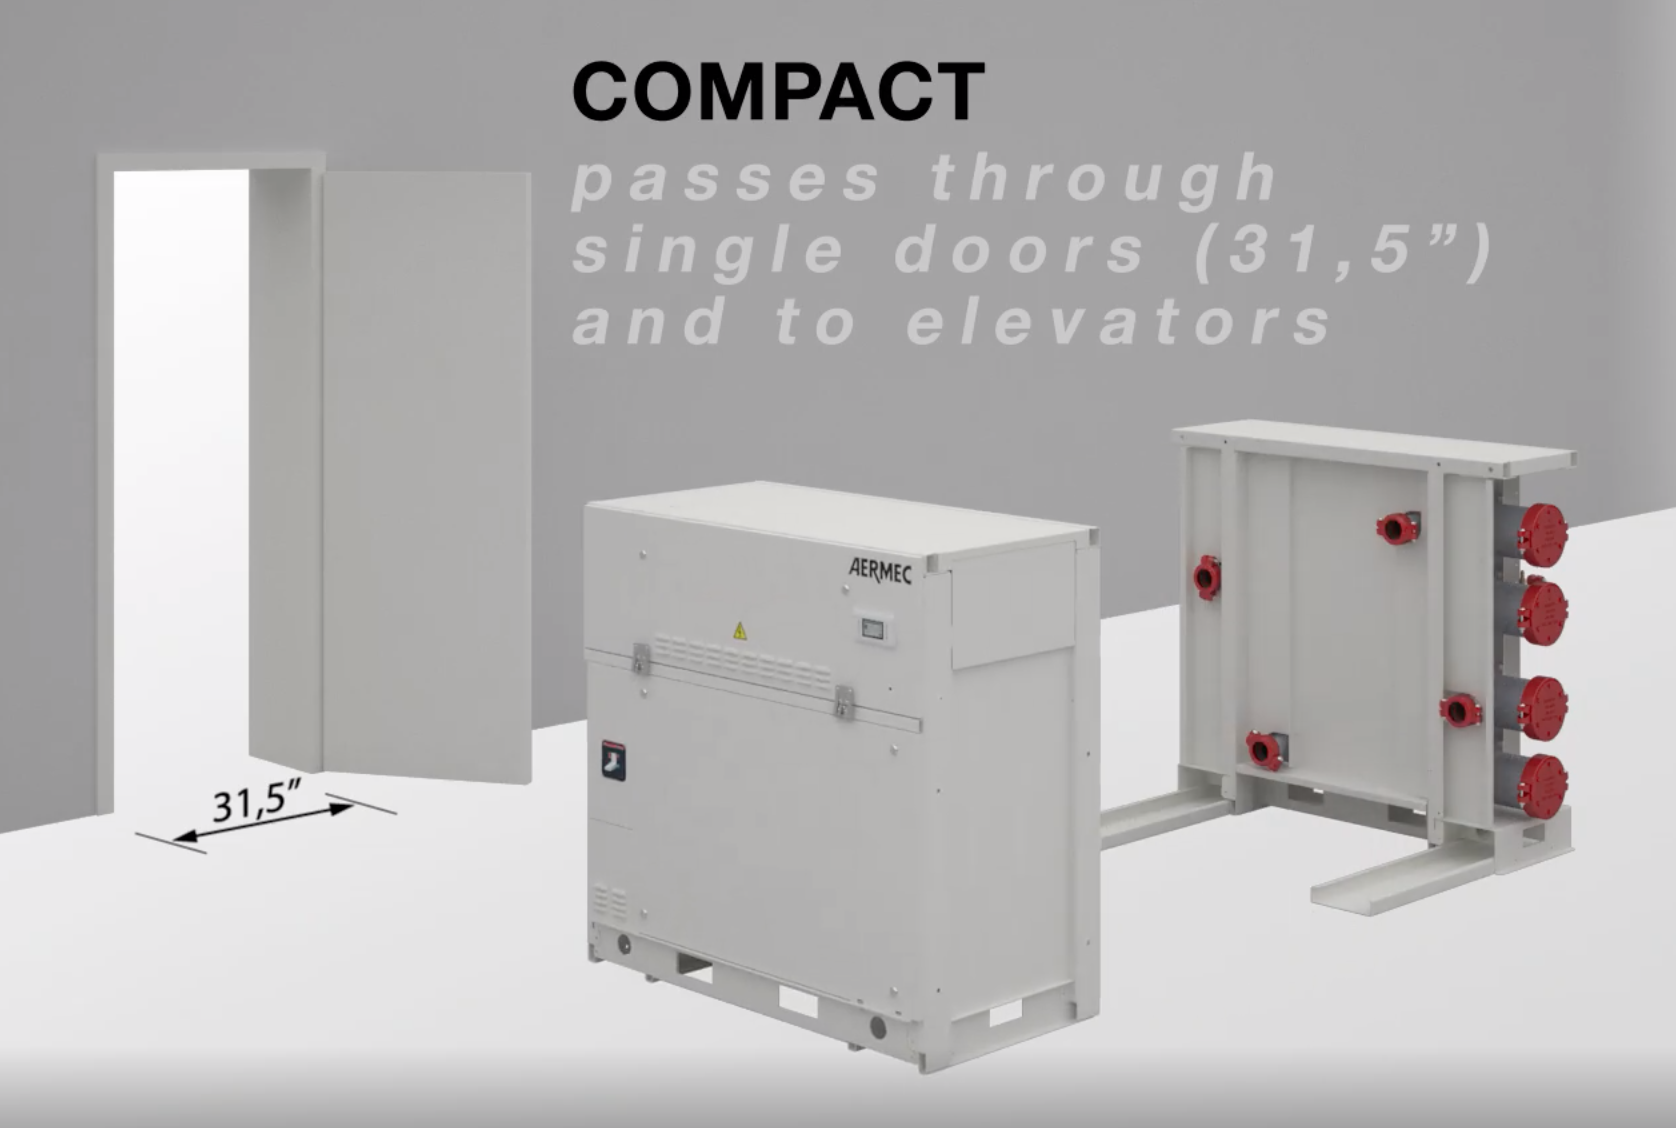 Aermec WWM Modular Chiller - Compact